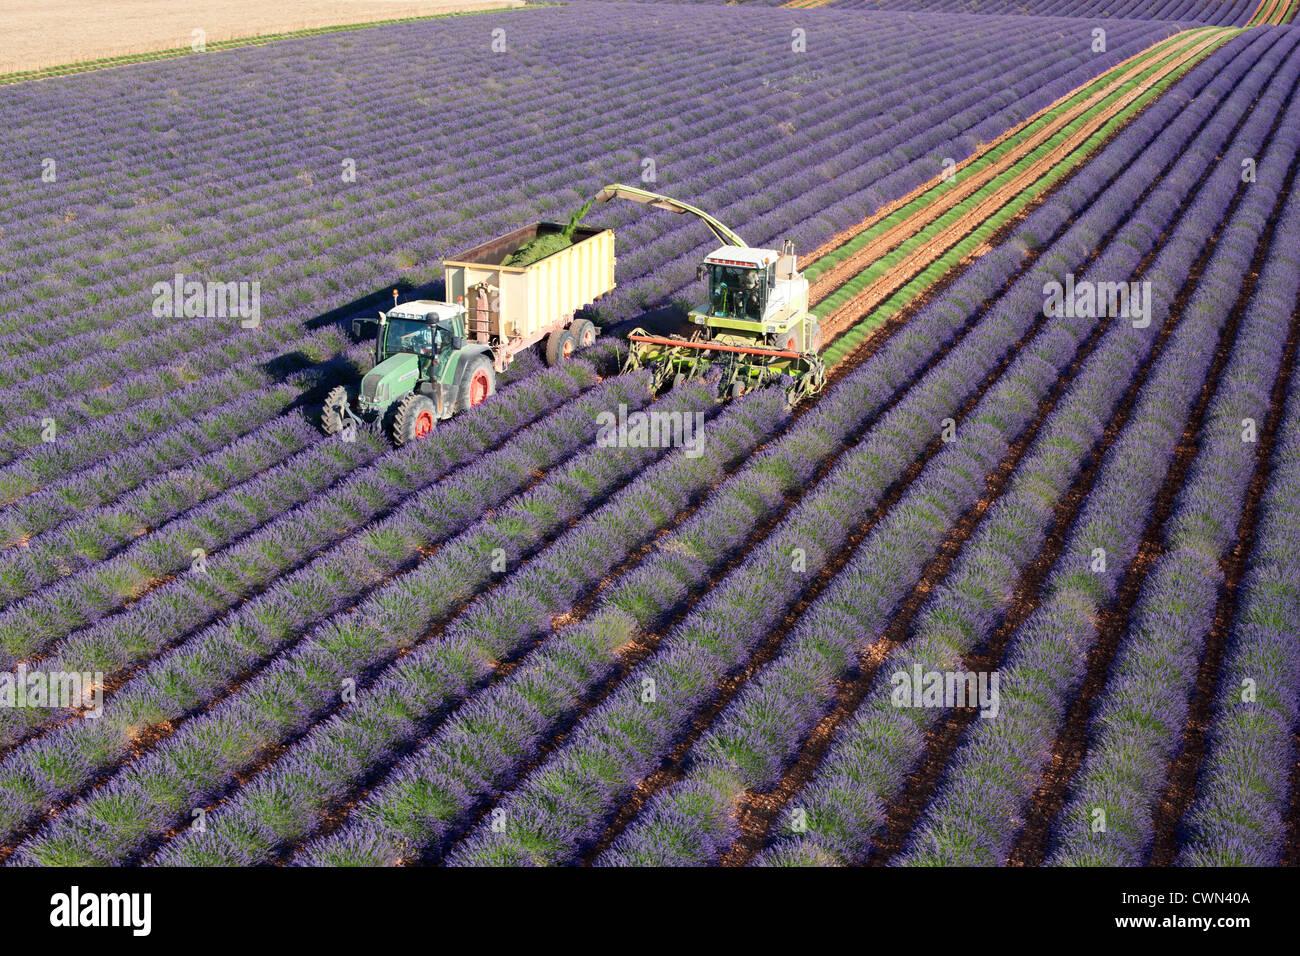 LAVENDER HARVEST (aerial view). Puimoisson, Valensole Plateau, Provence, France. - Stock Image